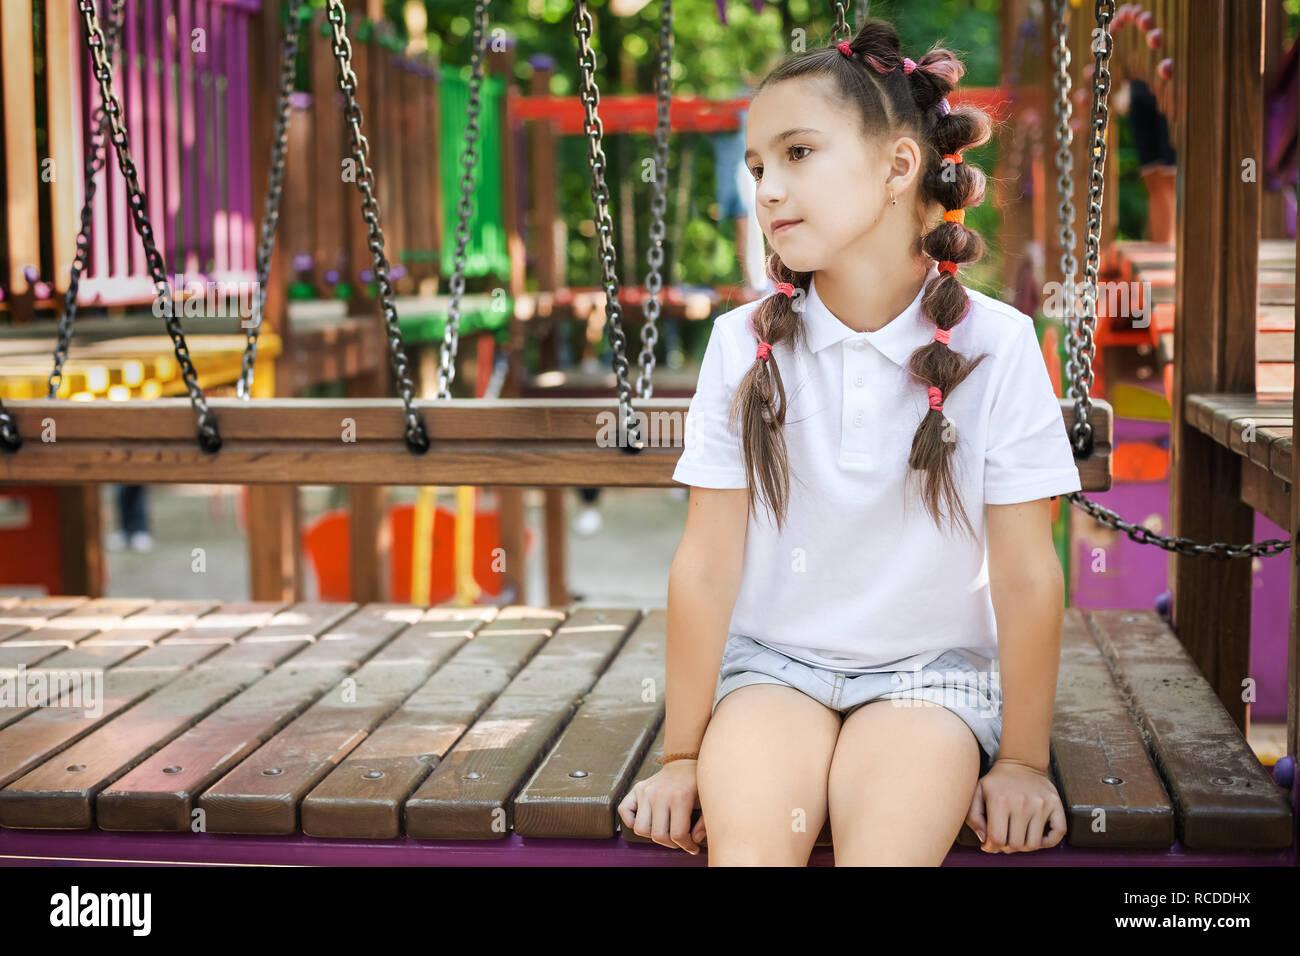 child girl at the playground - Stock Image